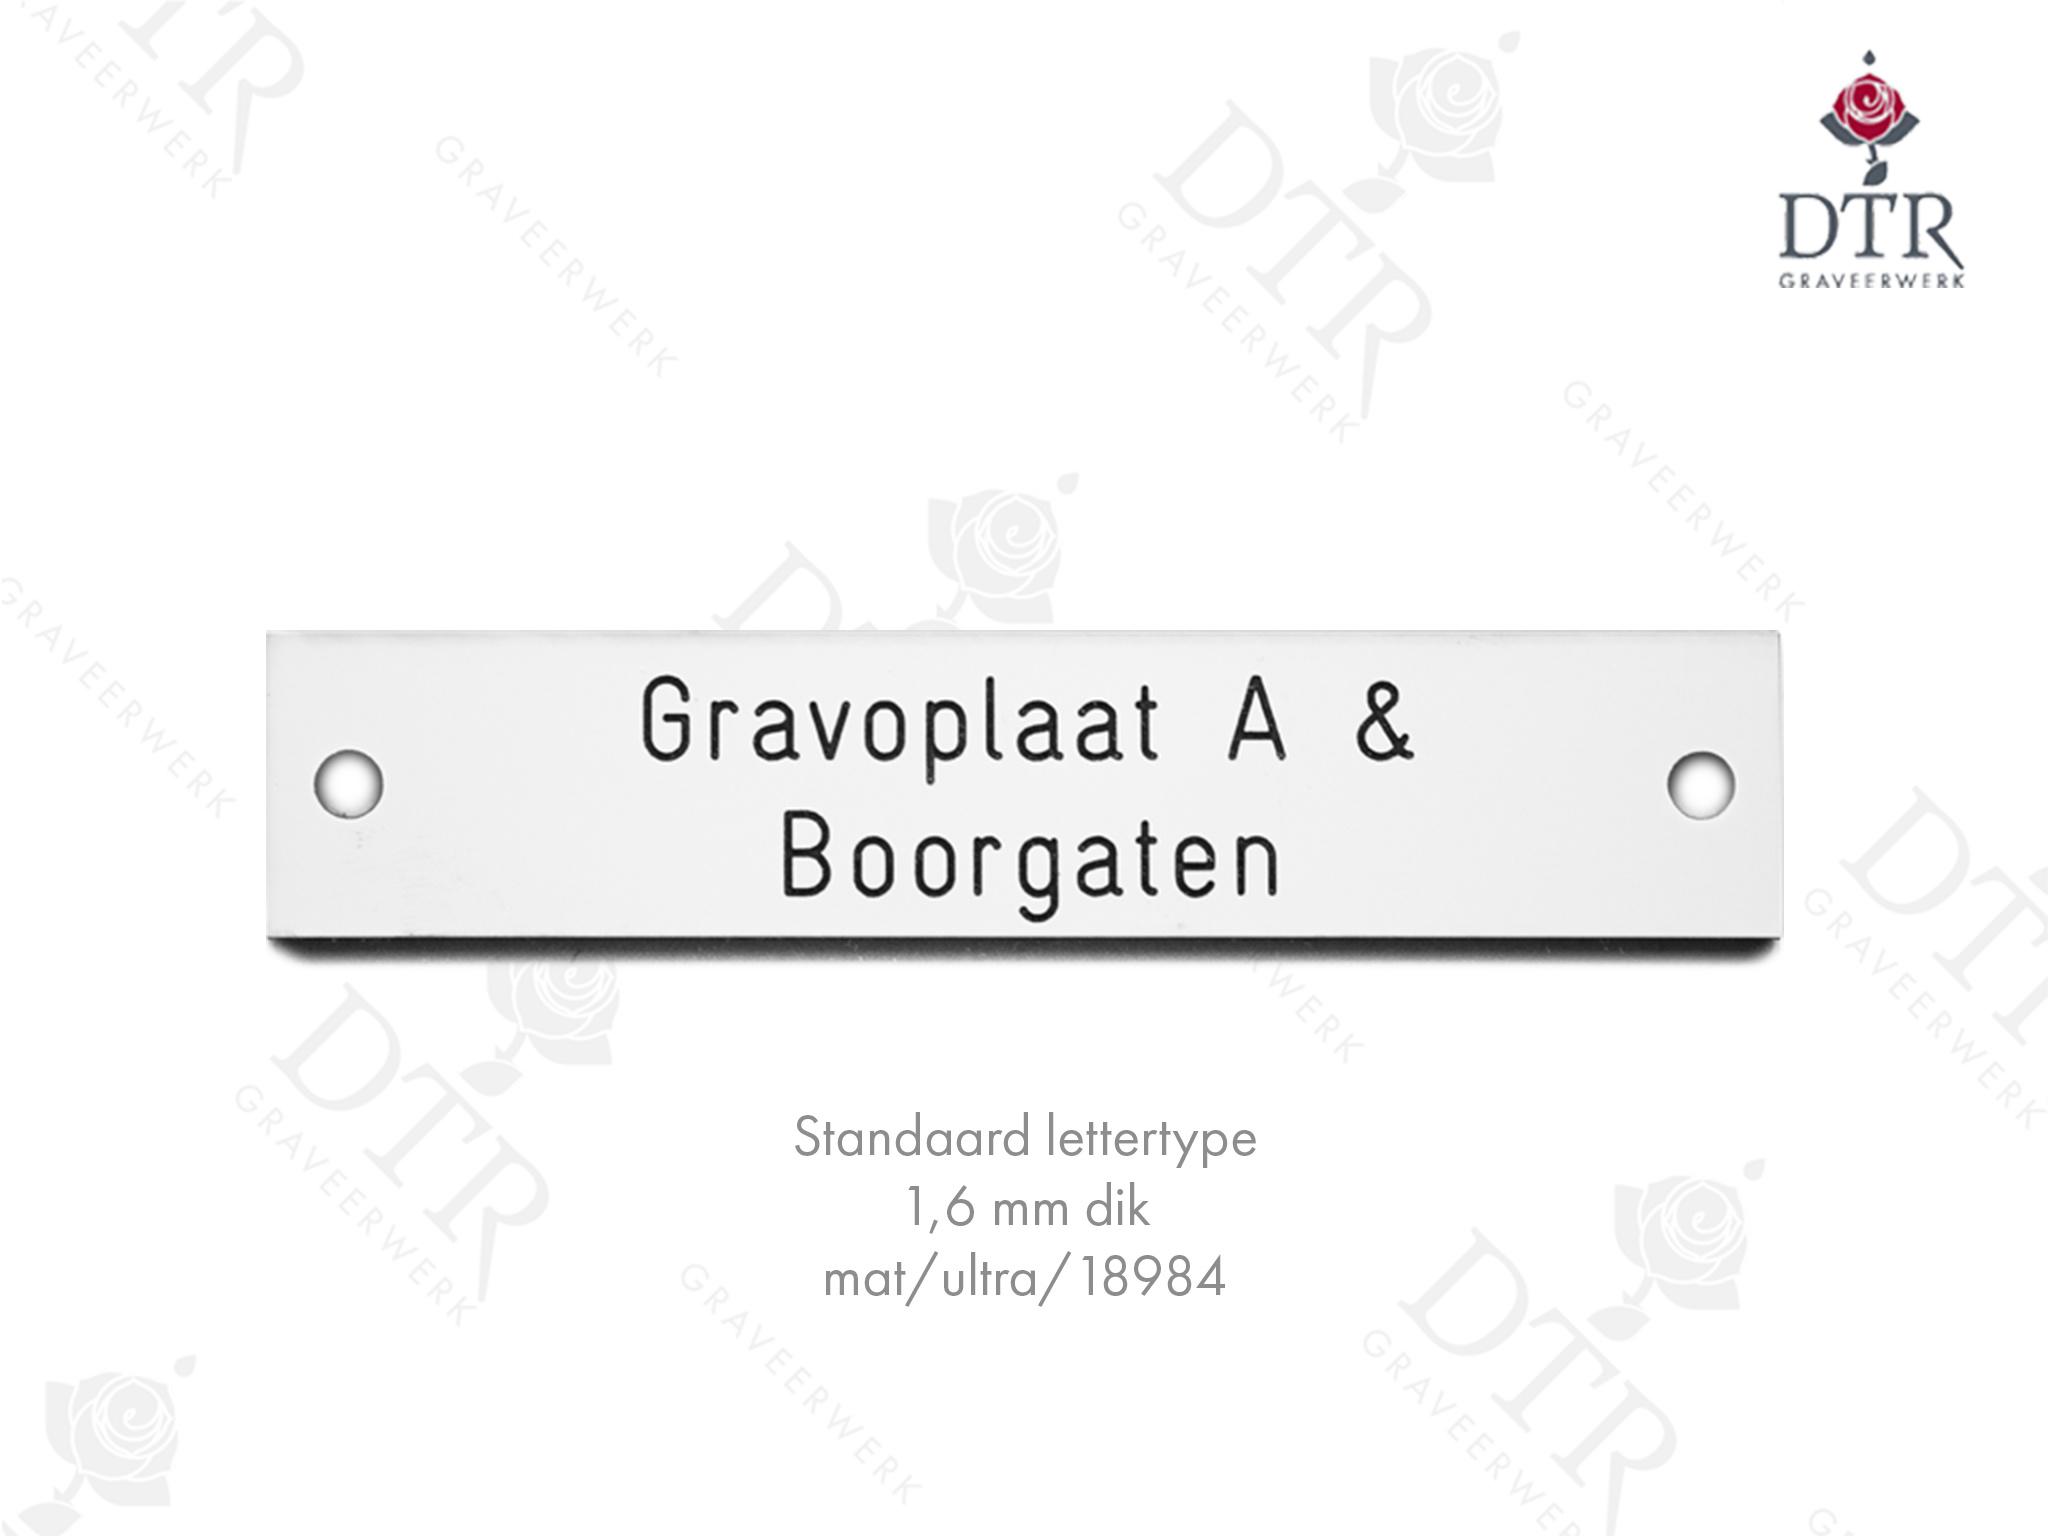 Beethovenlaan 412/458 1/200/199